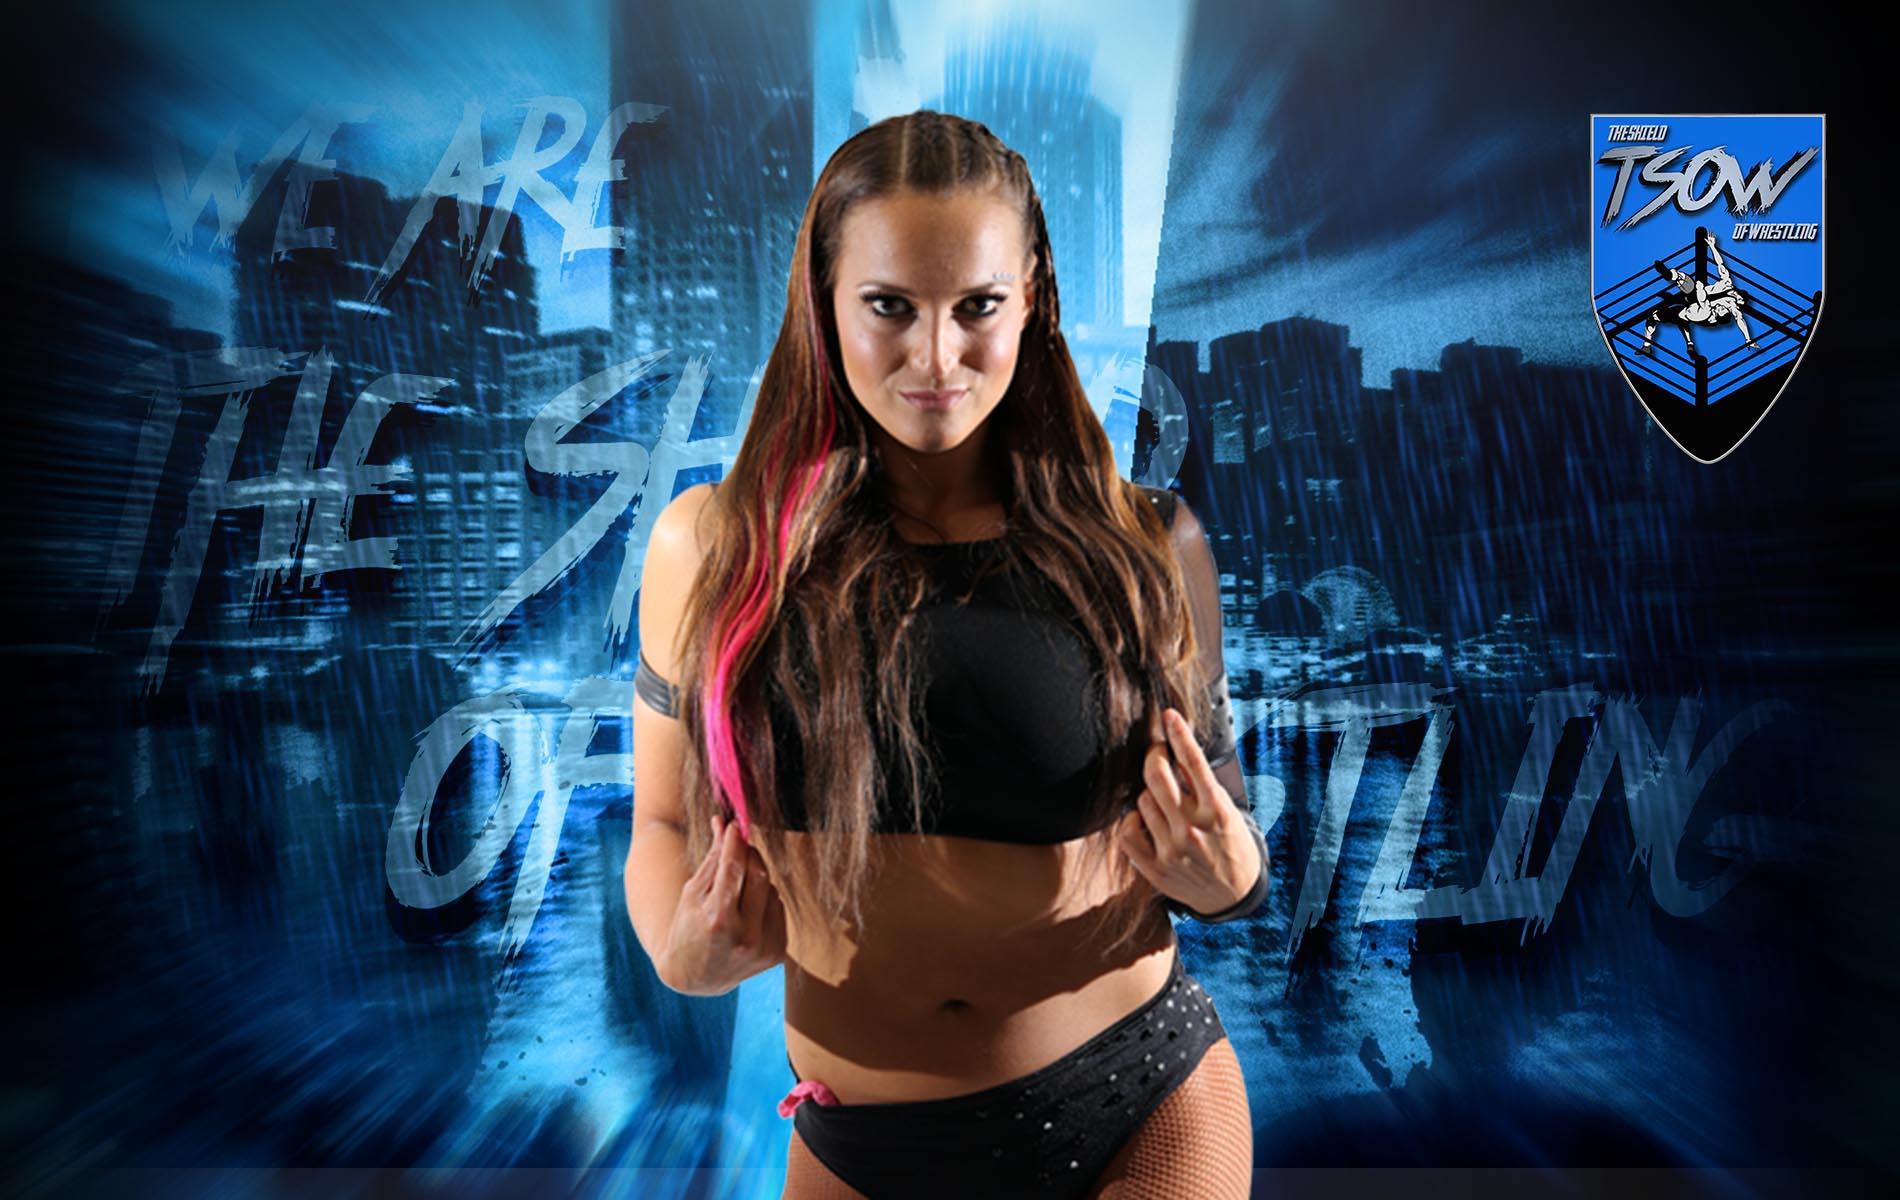 Kelly Klein incolpa la ROH di aver coperto le accuse su Jay Lethal